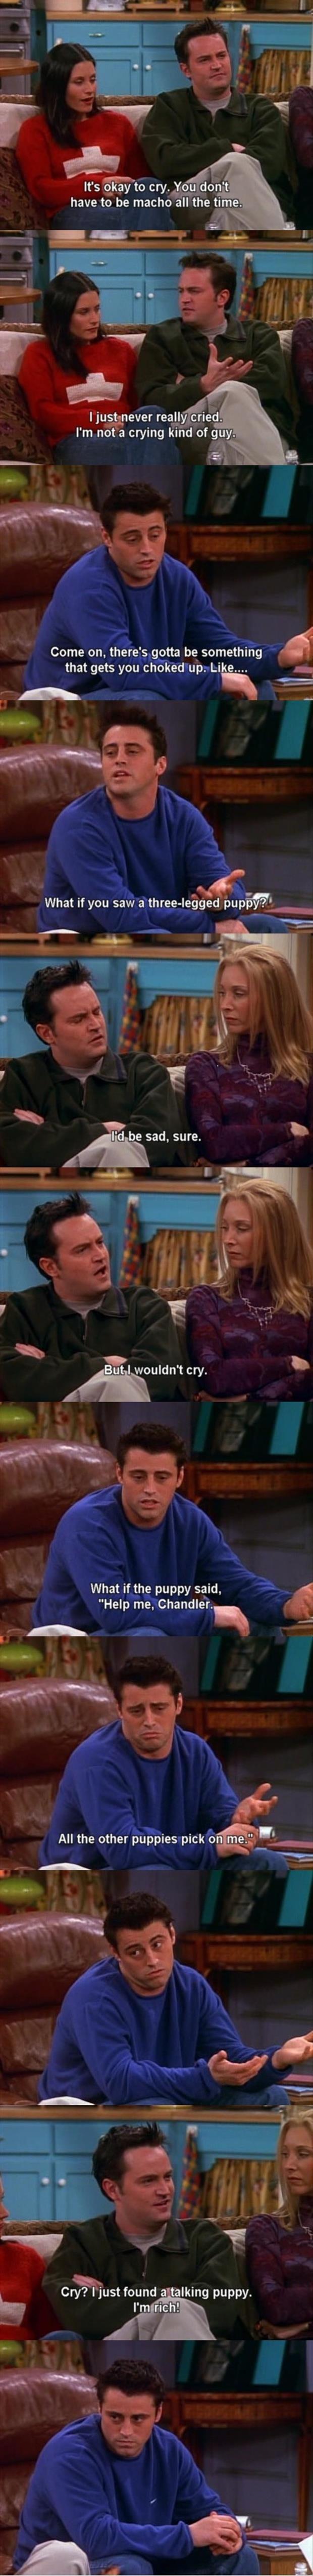 Oh, Chandler.